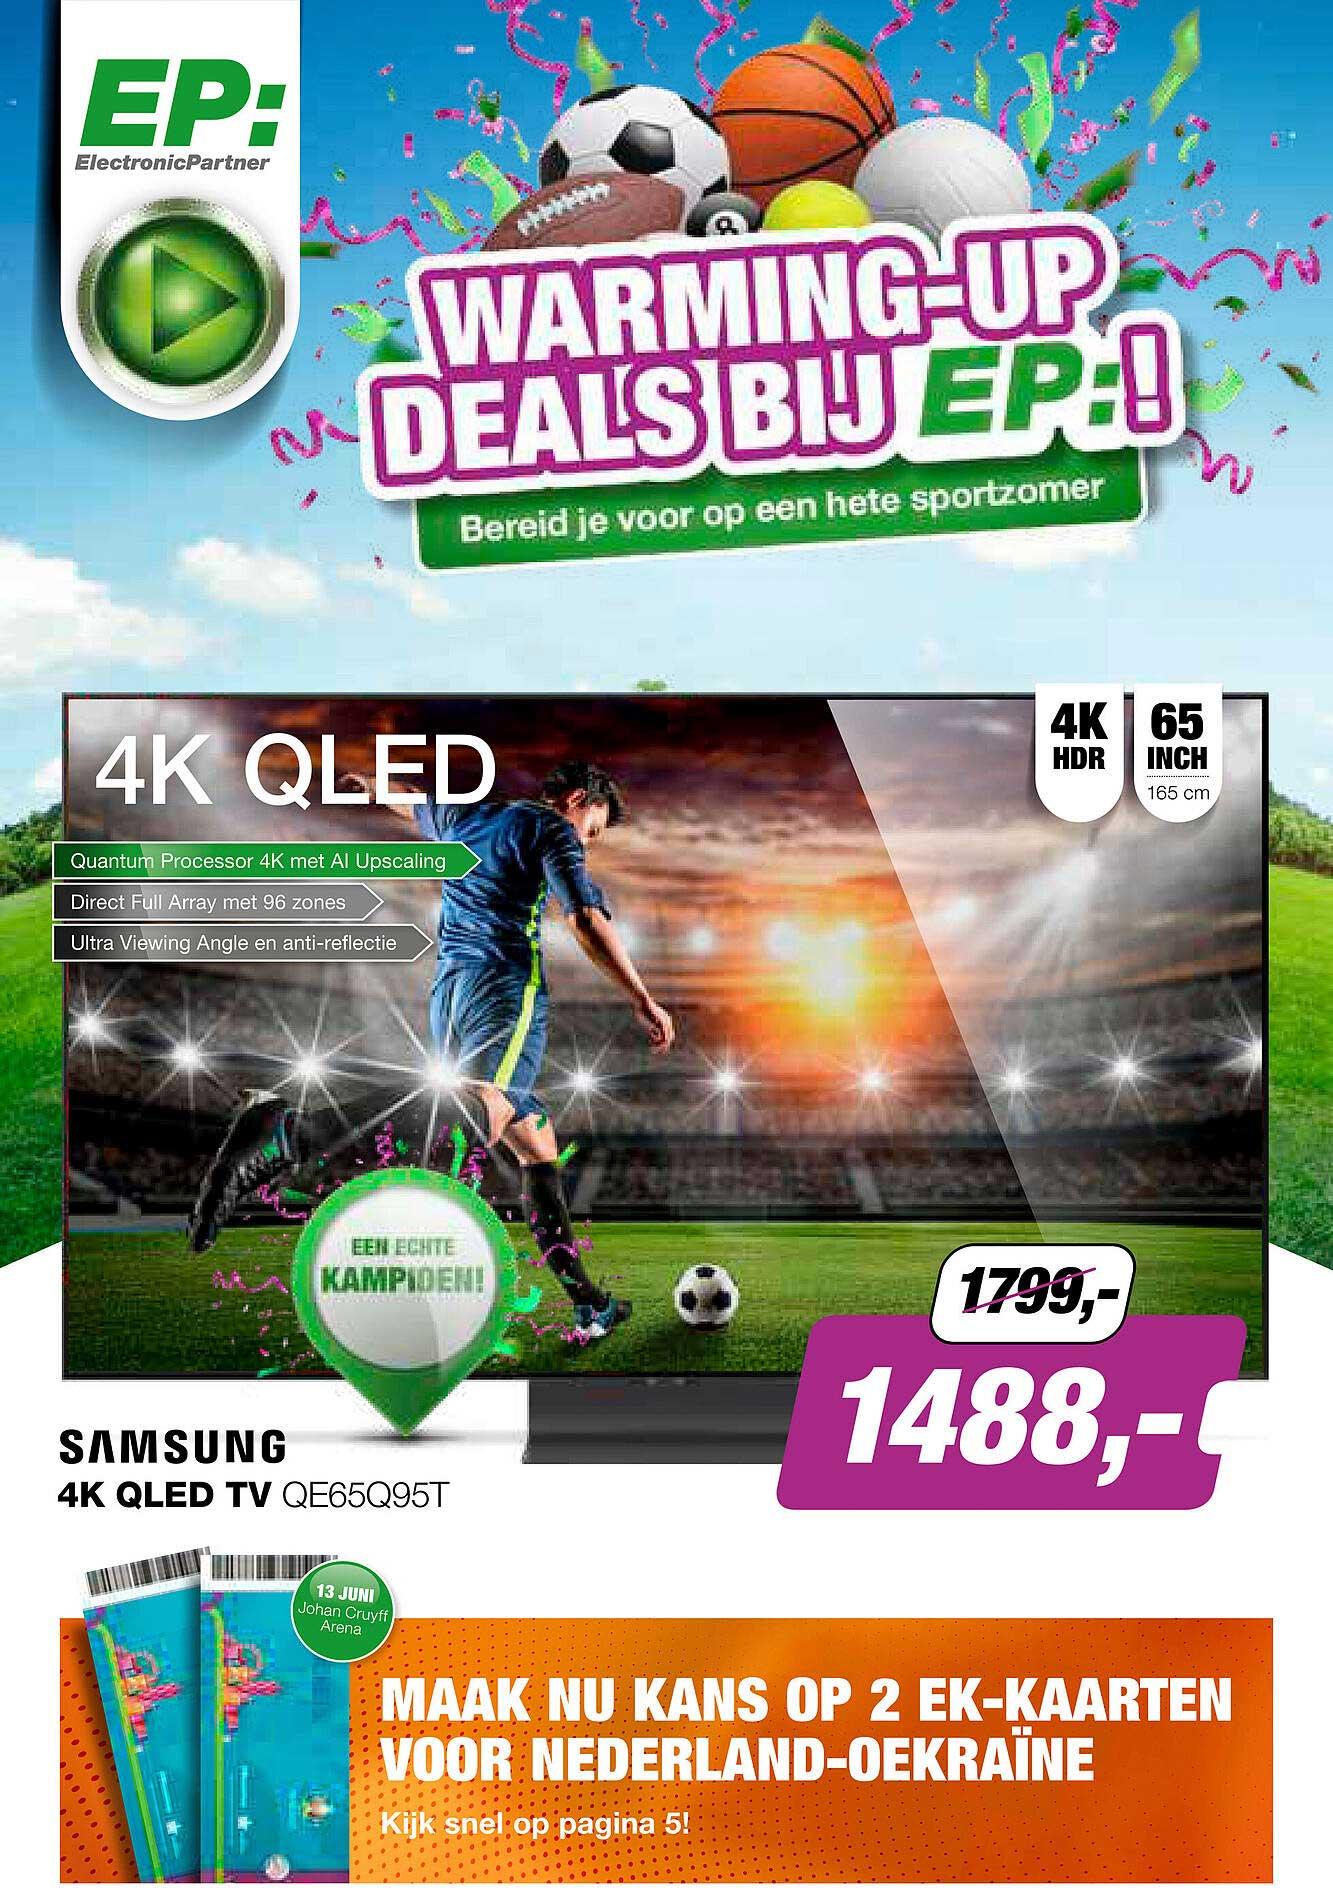 EP Samsung 4K QLED TV QE65Q95T